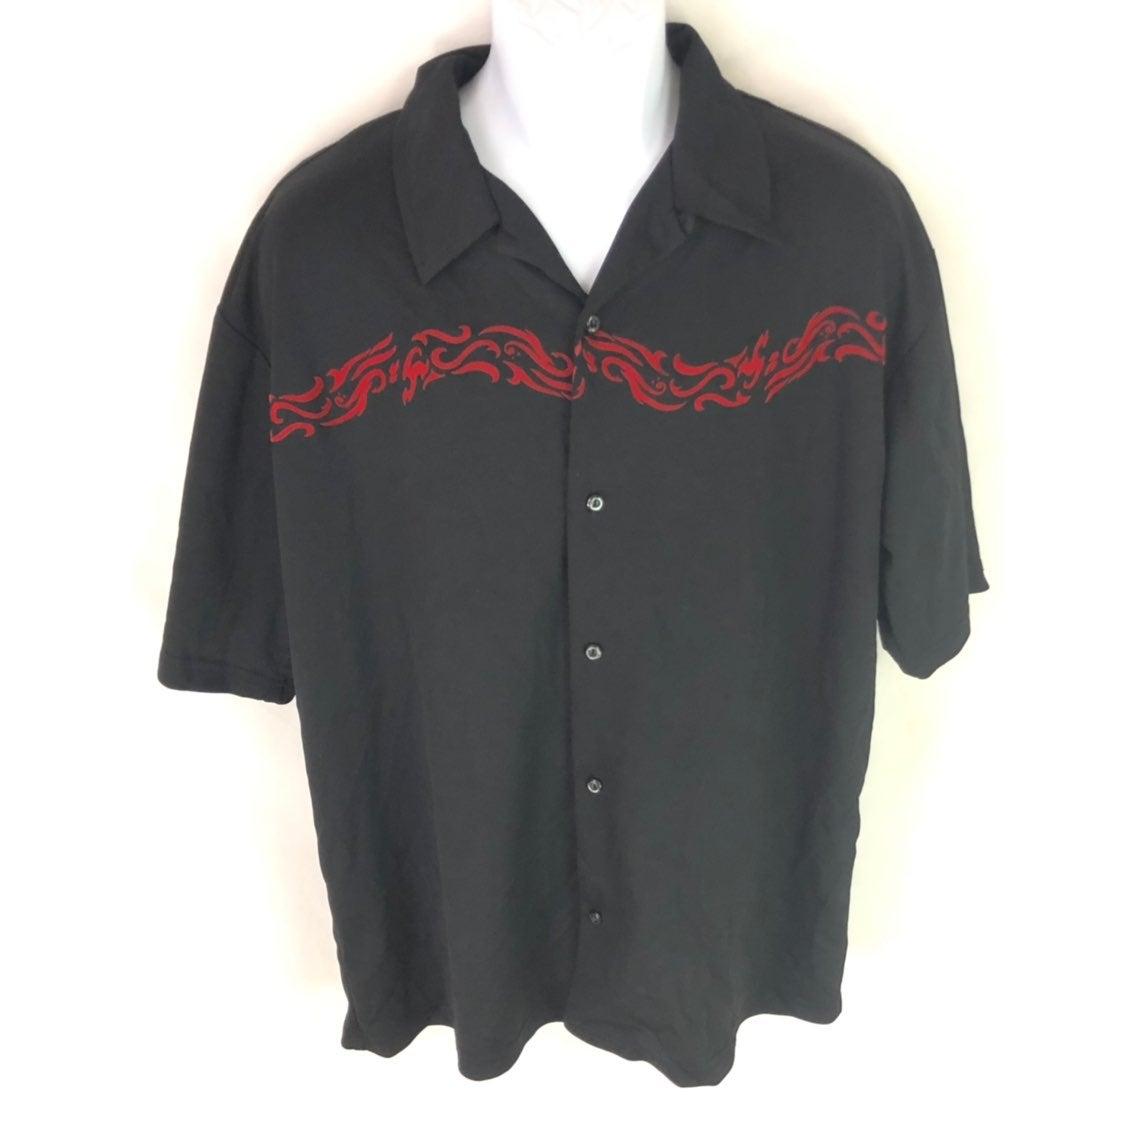 Anchor Blue Men's Black Flame Shirt L